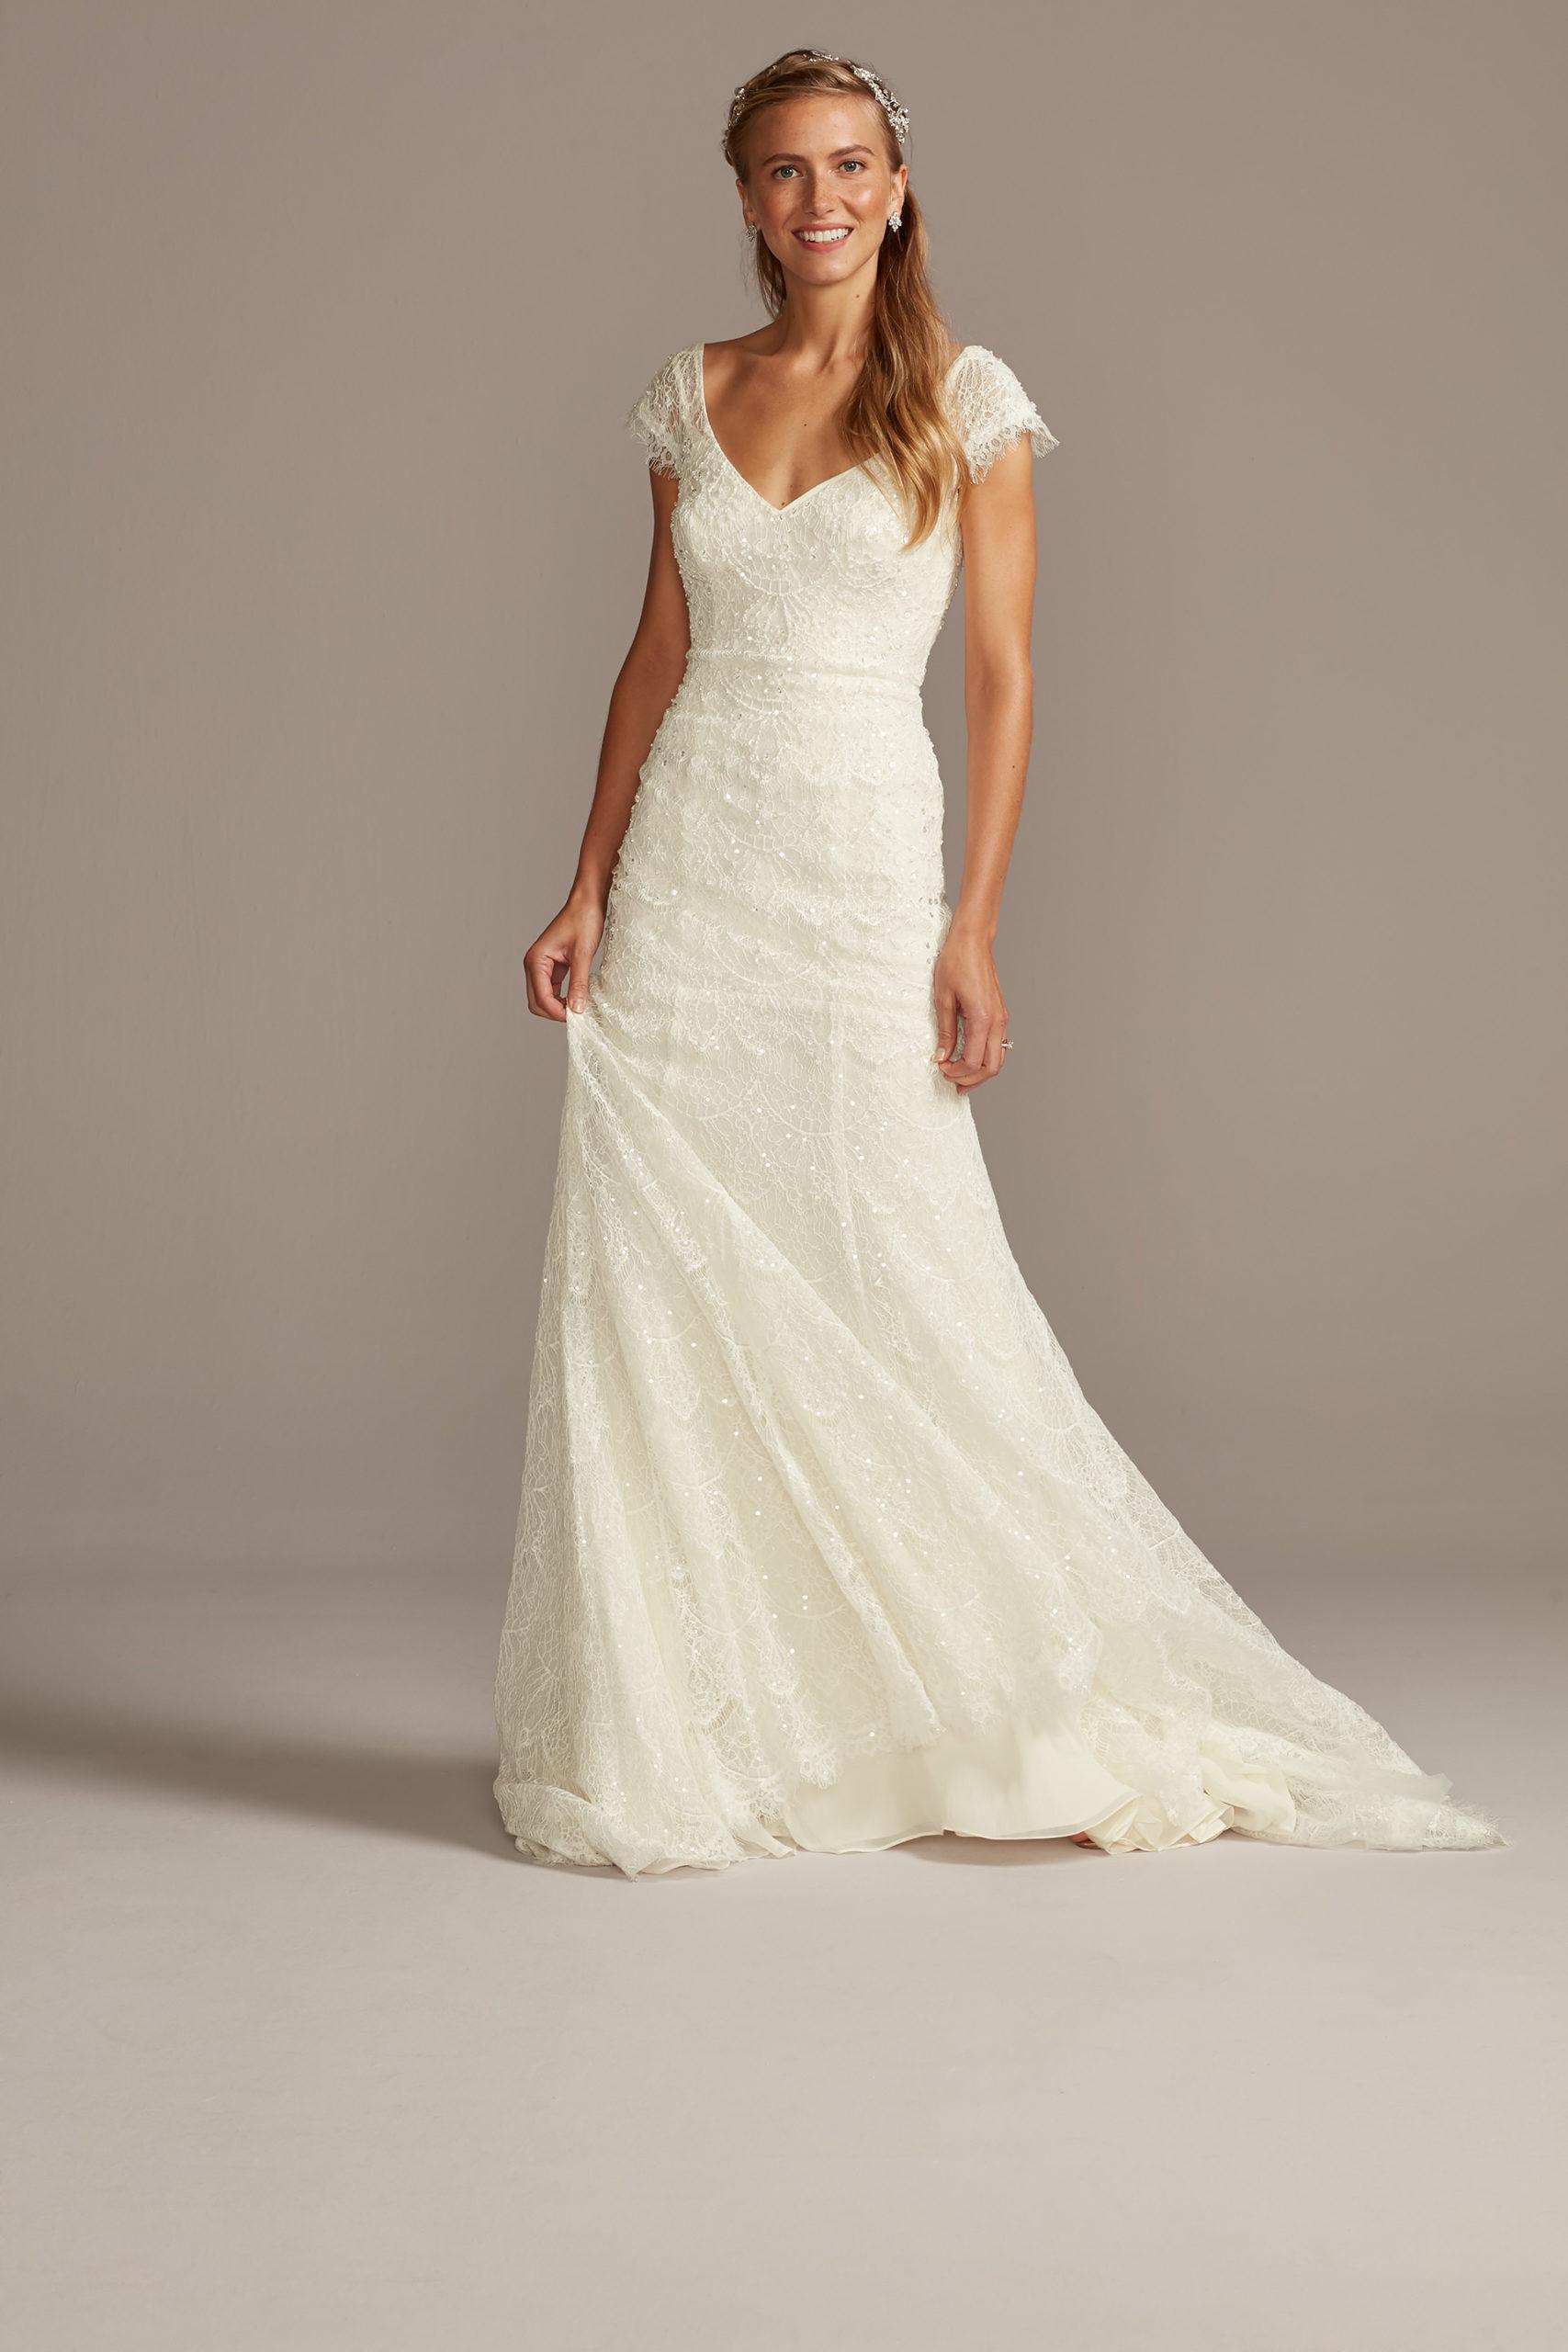 bride wearing wedding dress with cap sleeves